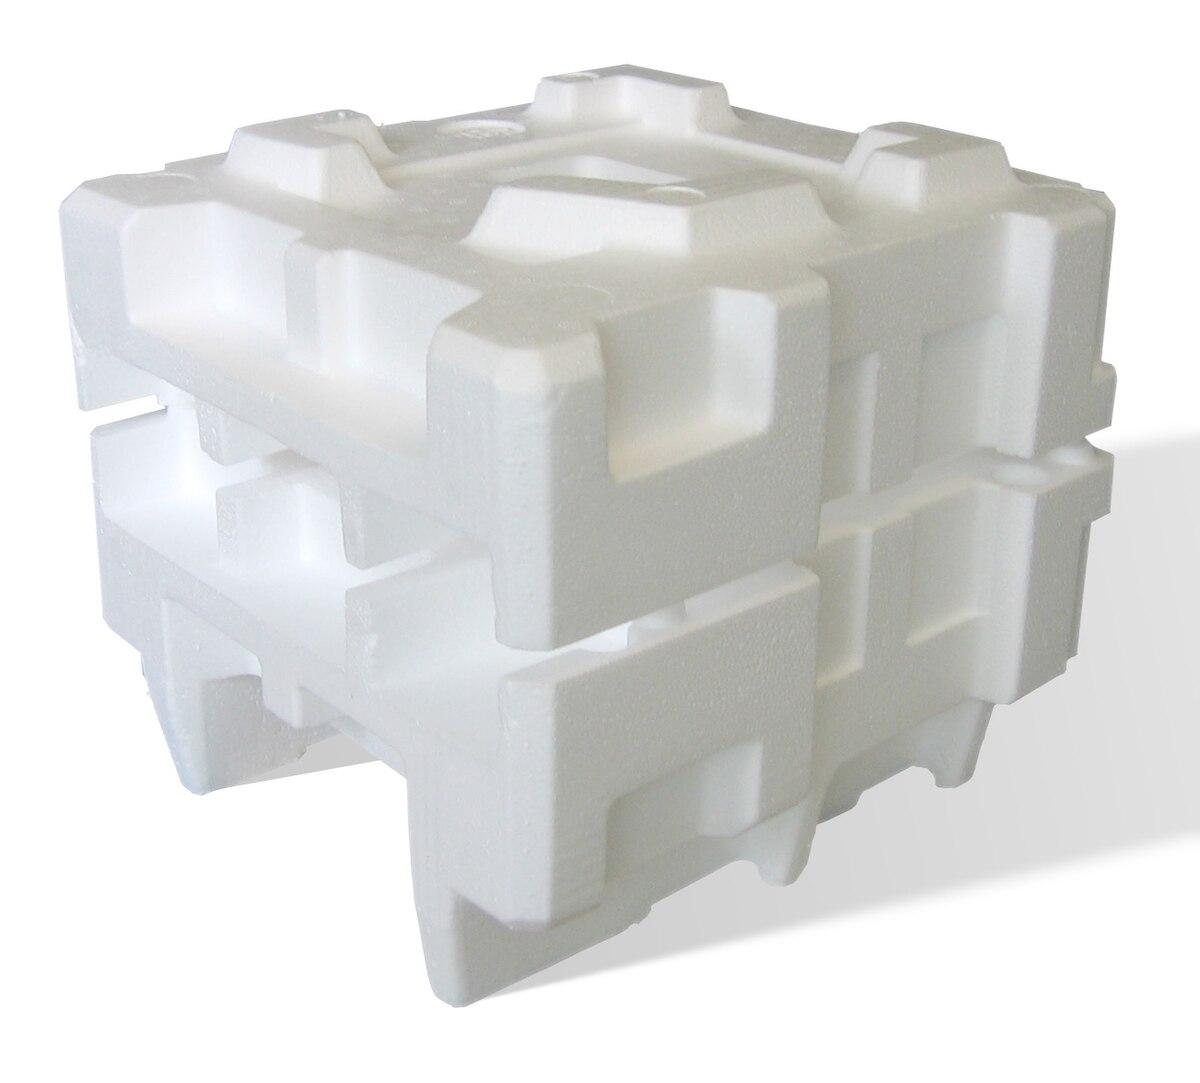 Poliestireno expandido wikipedia la enciclopedia libre for Styrofoam forms